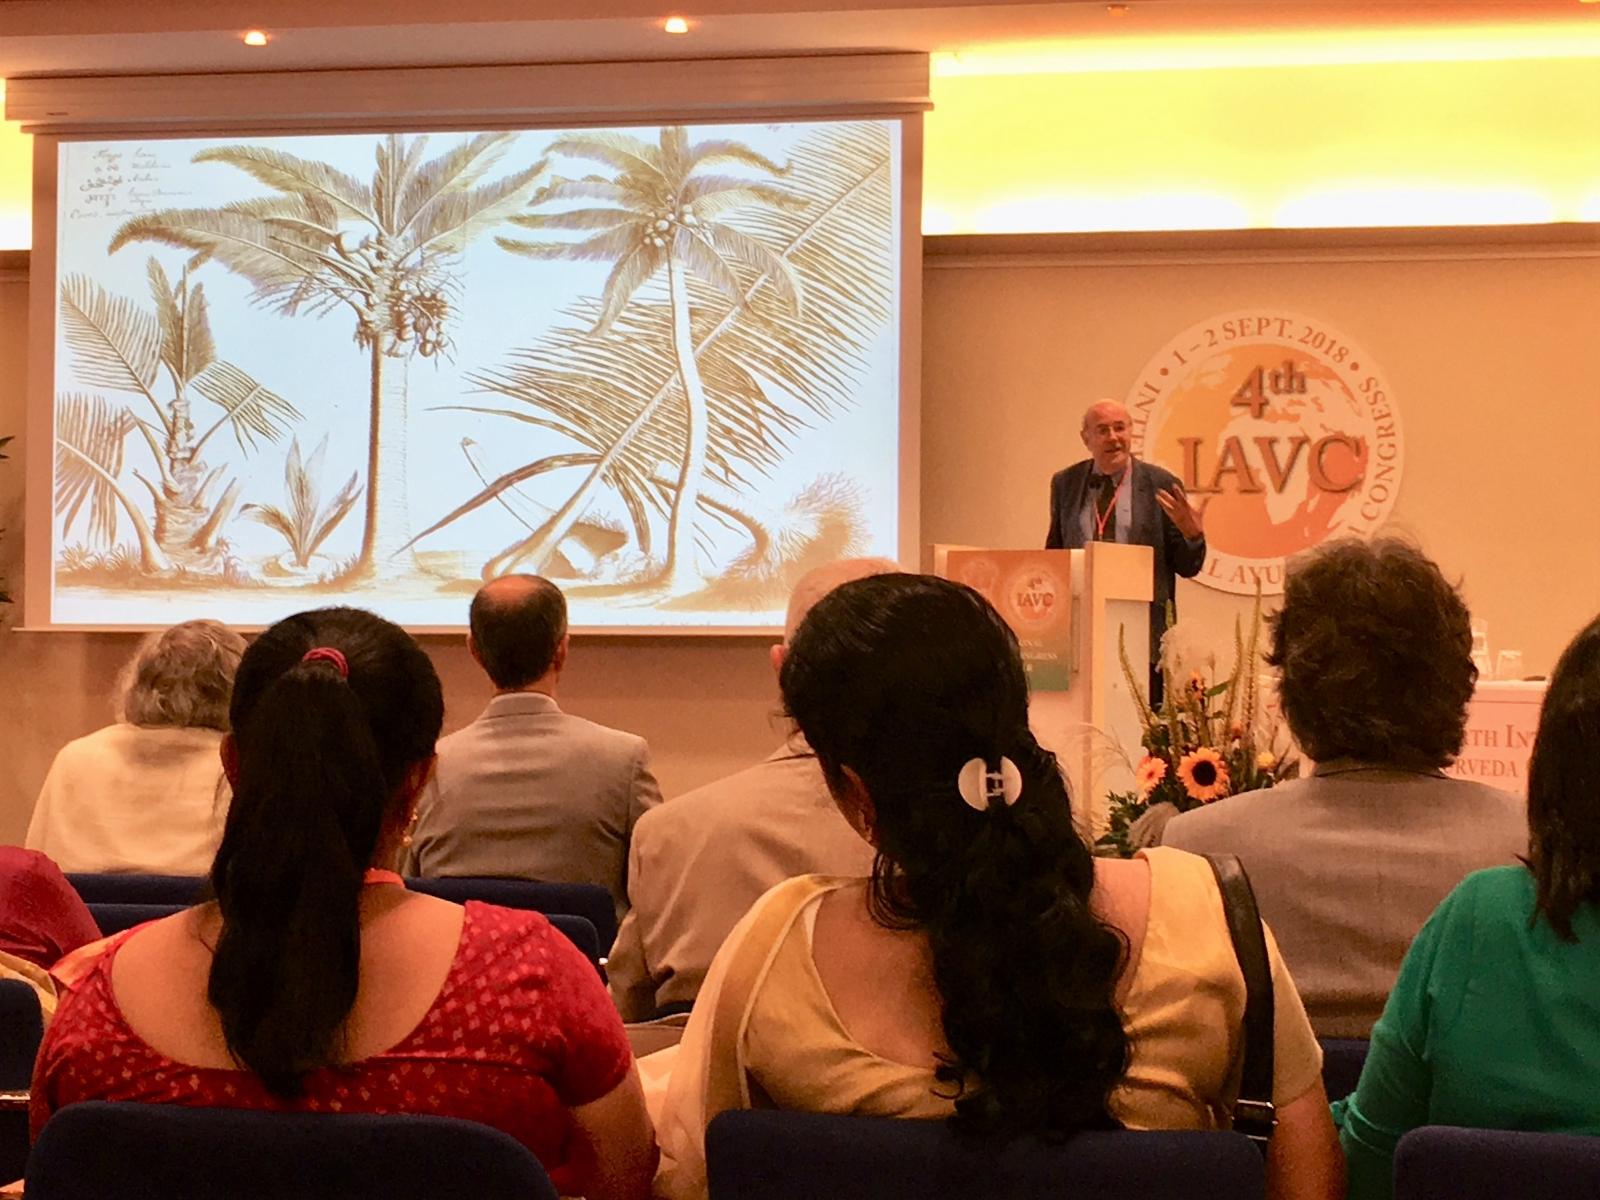 Ayur-Veda-Congres-Leiden-18-prof-Pieter-Baas-M-Bos-3-kokos